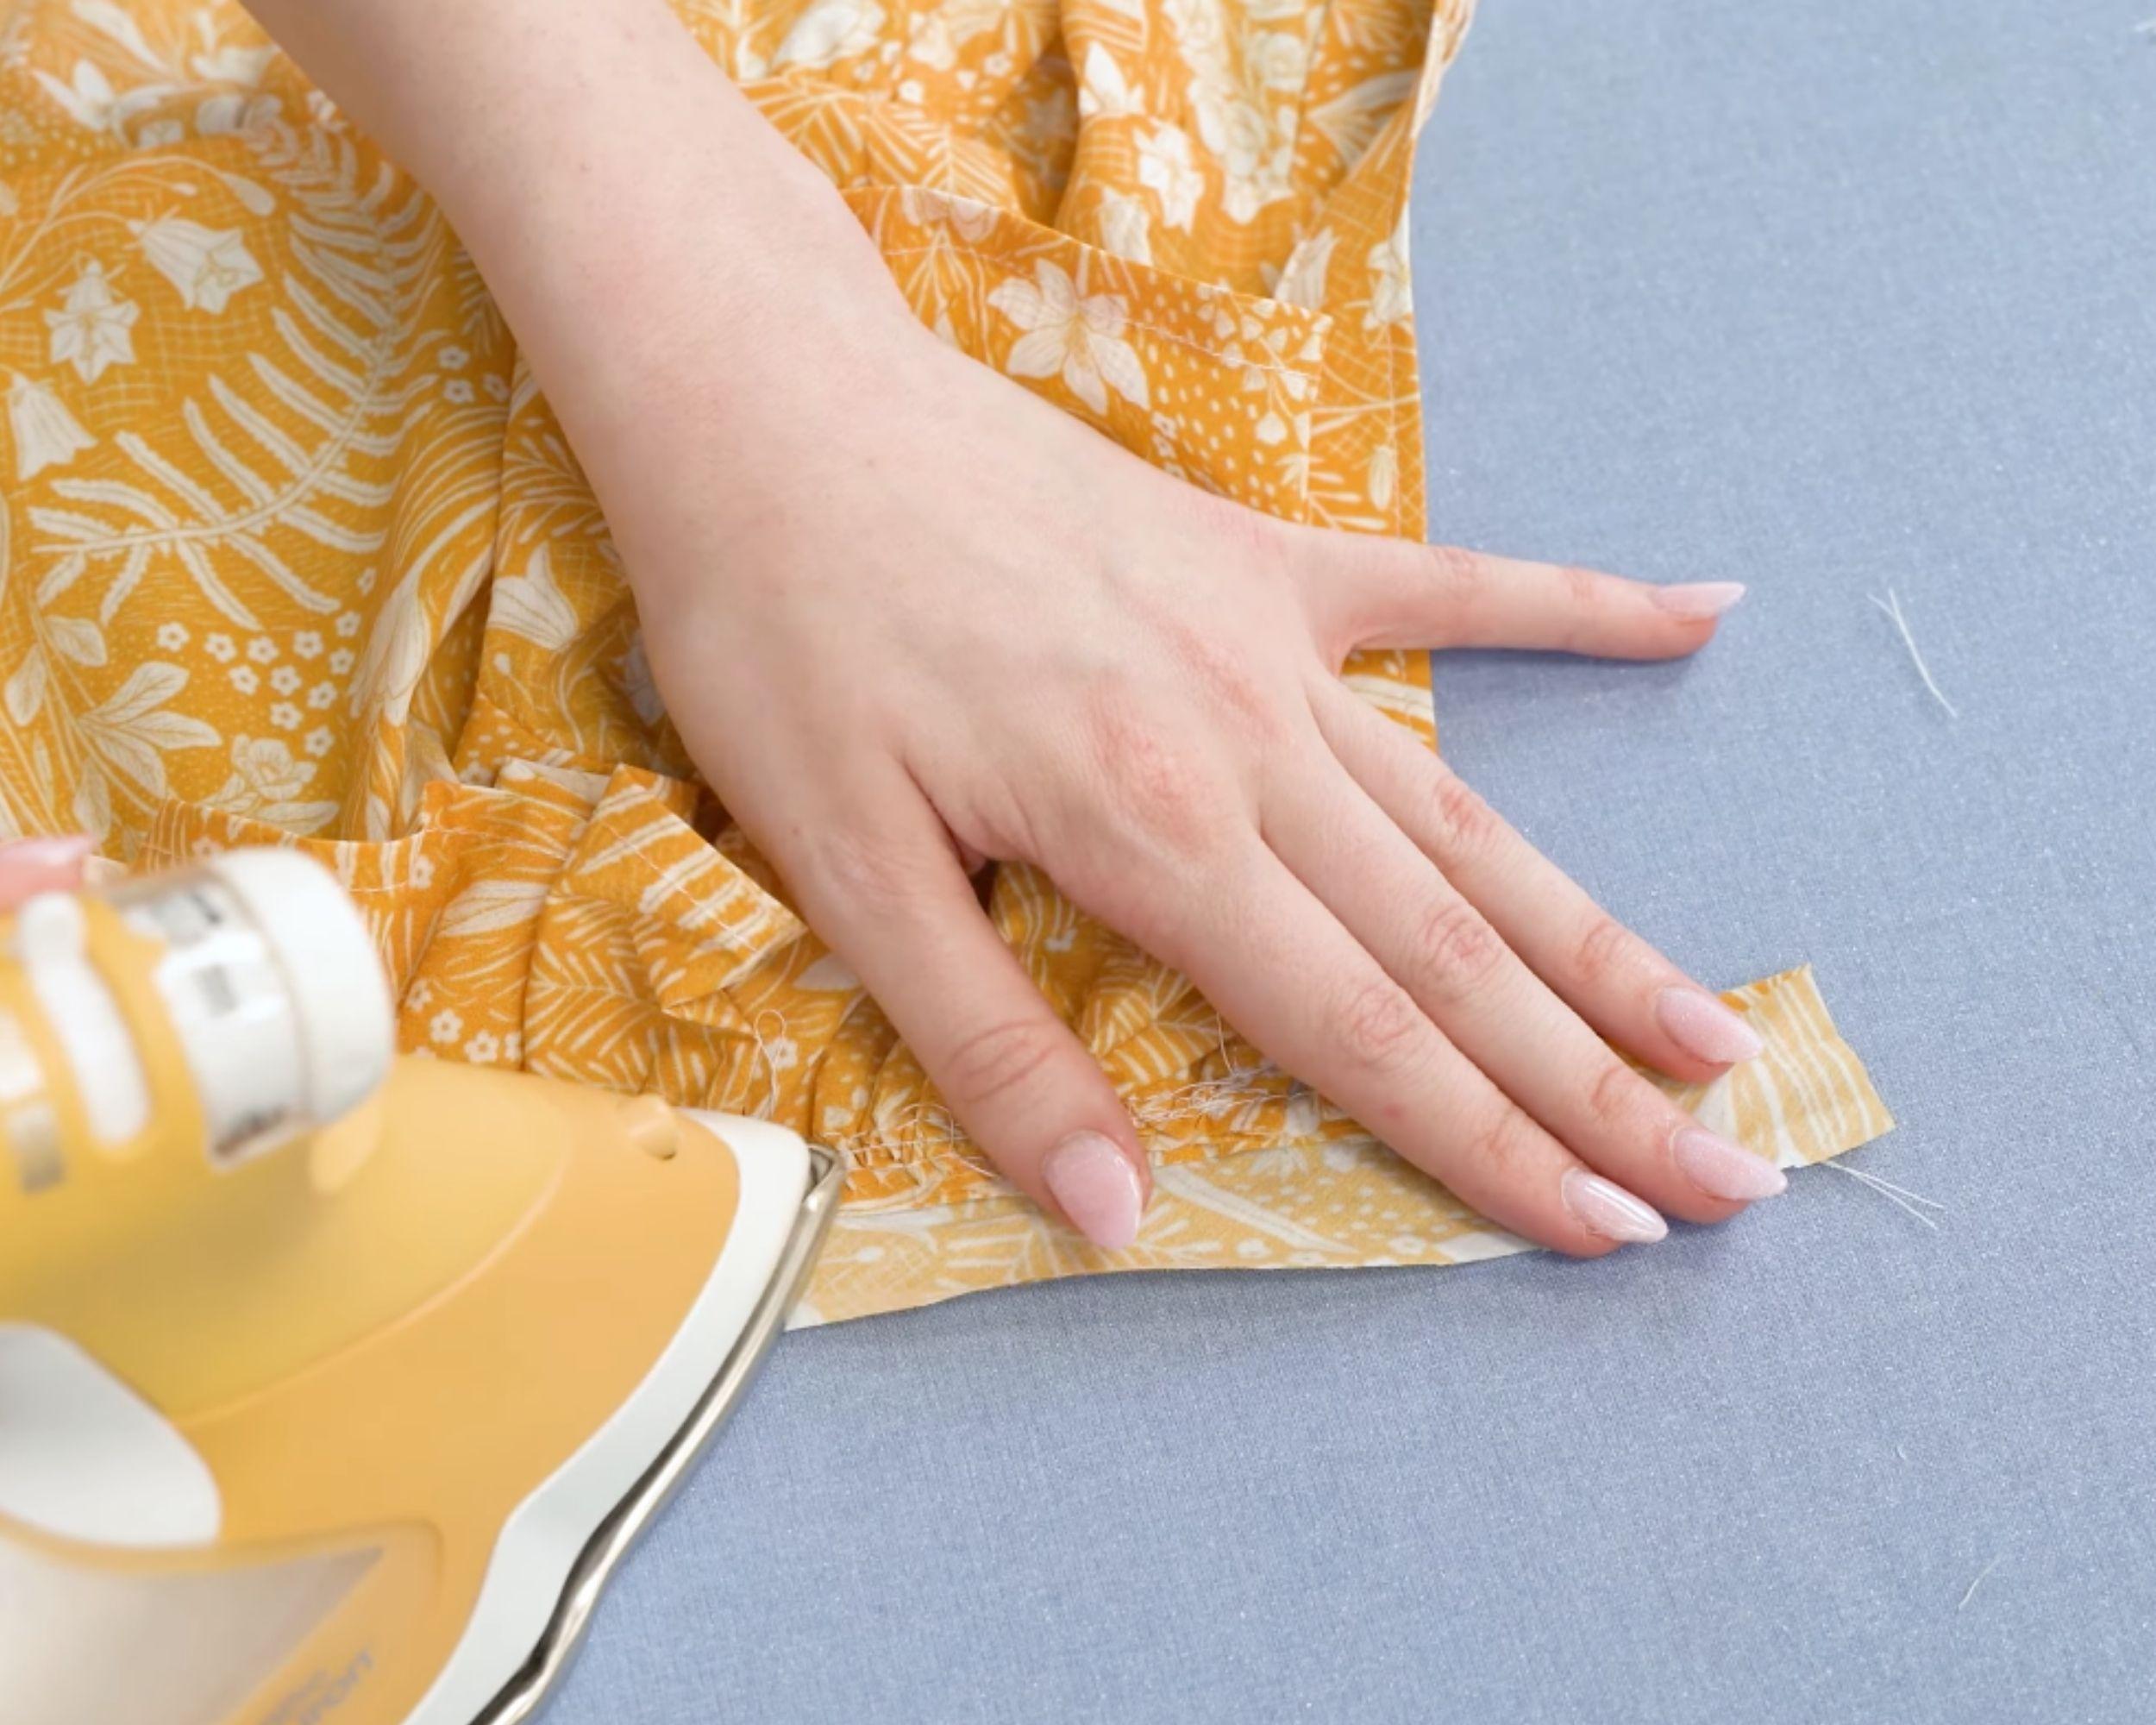 Ironing in the neckline binding